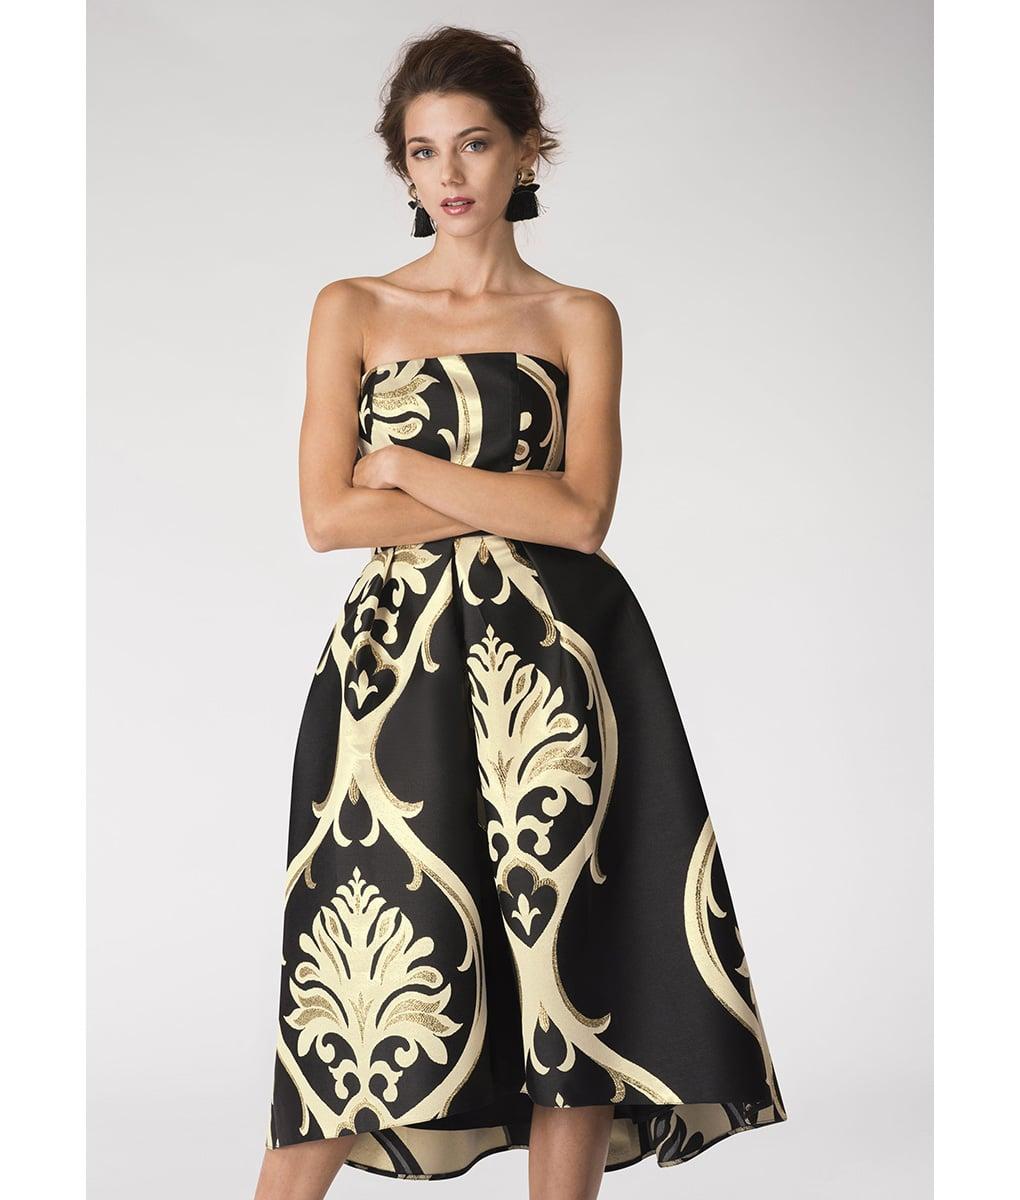 Alila-Strapless-brocade-black-and-gold-evening-dress-Closet-London